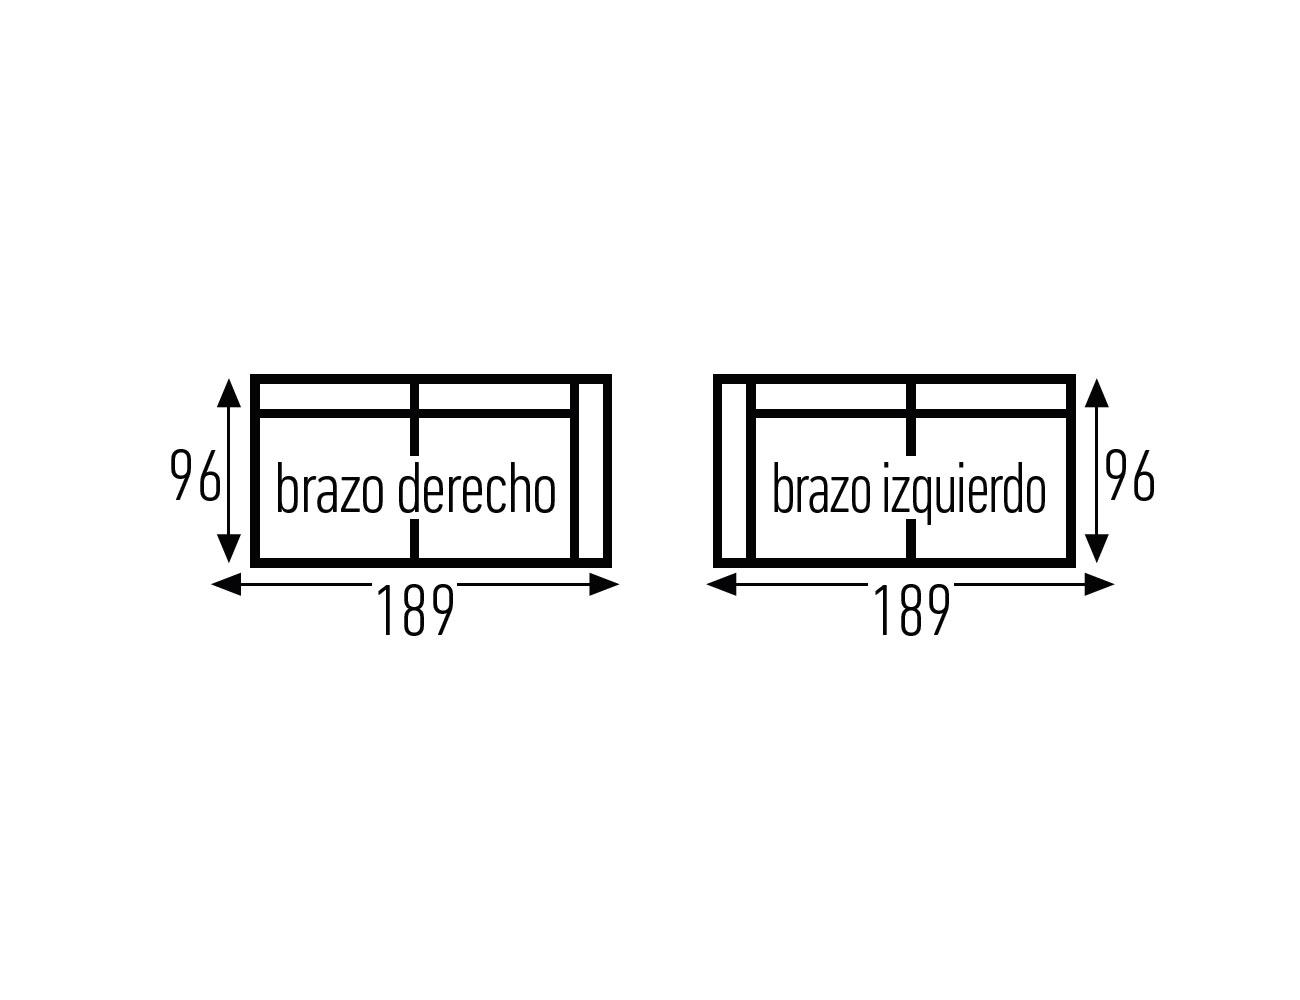 Croquis 3p sin 1 brazo 1896